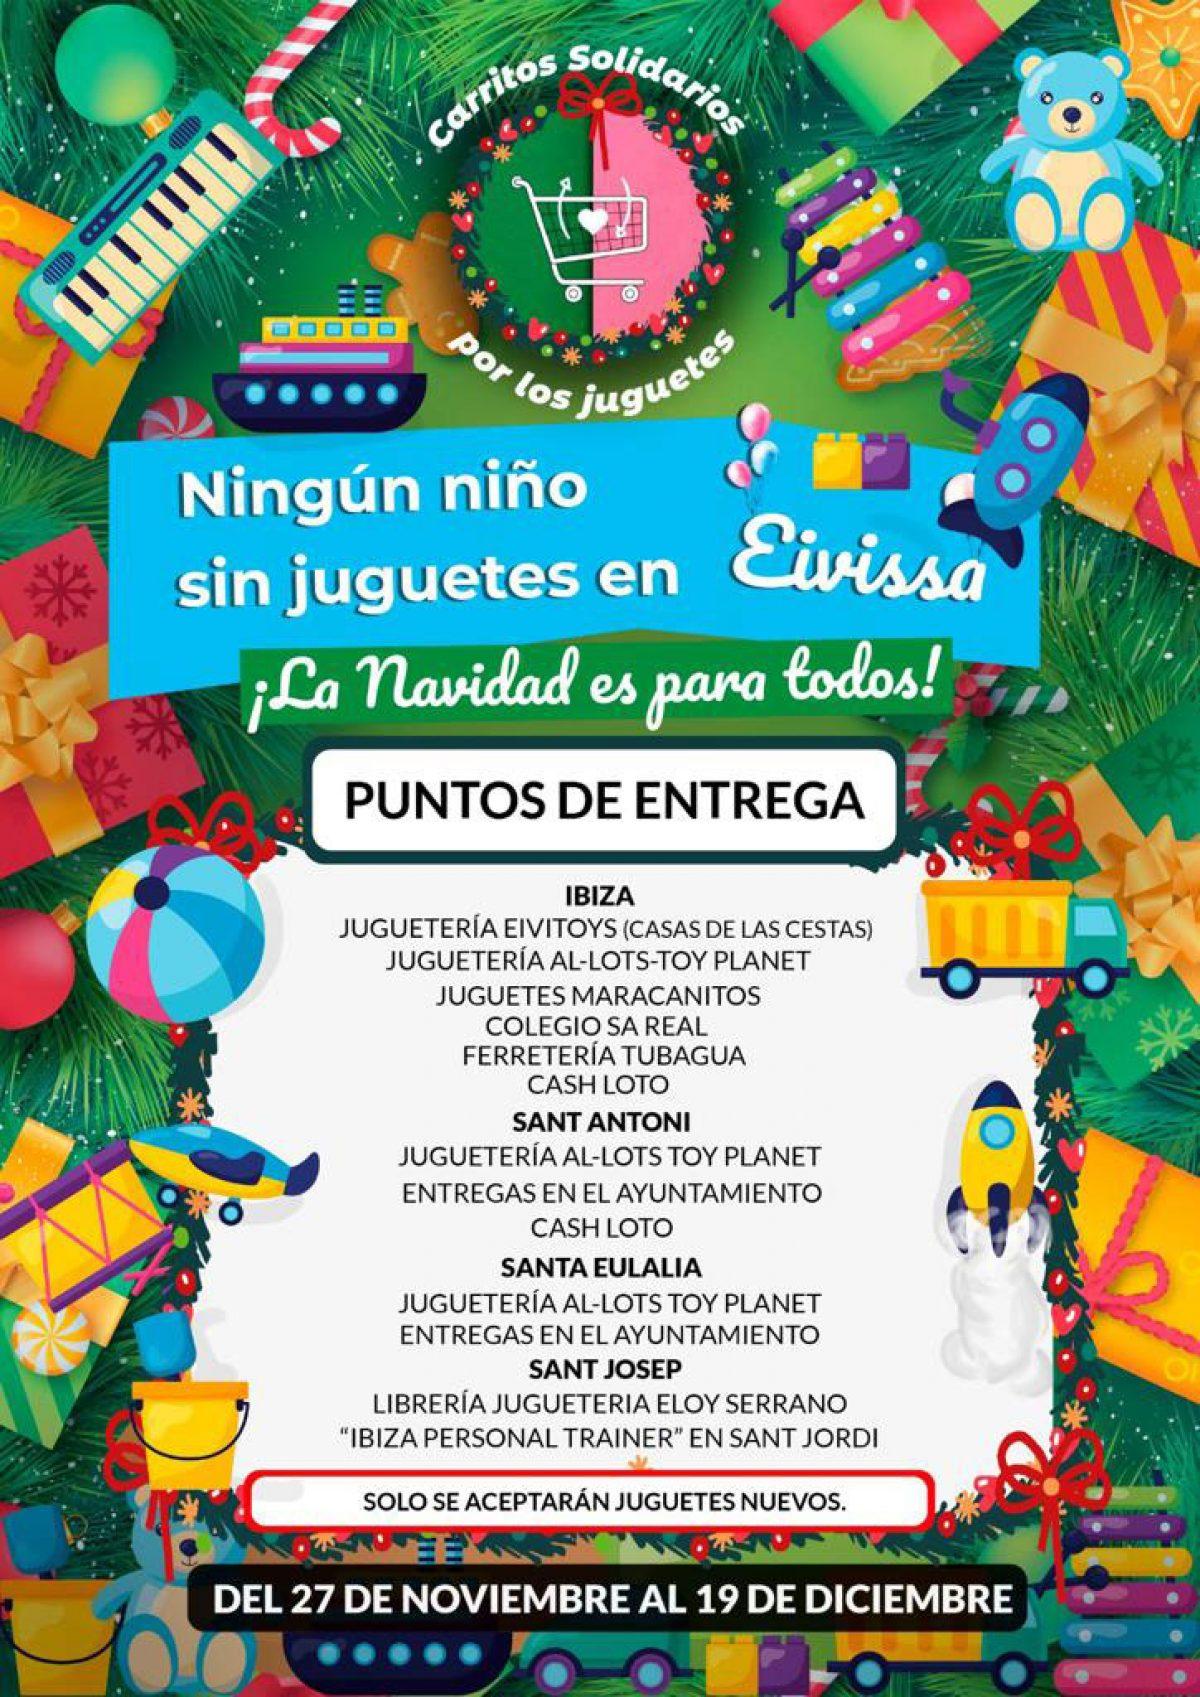 recollida-joguines-nadal-Eivissa-2020-welcometoibiza